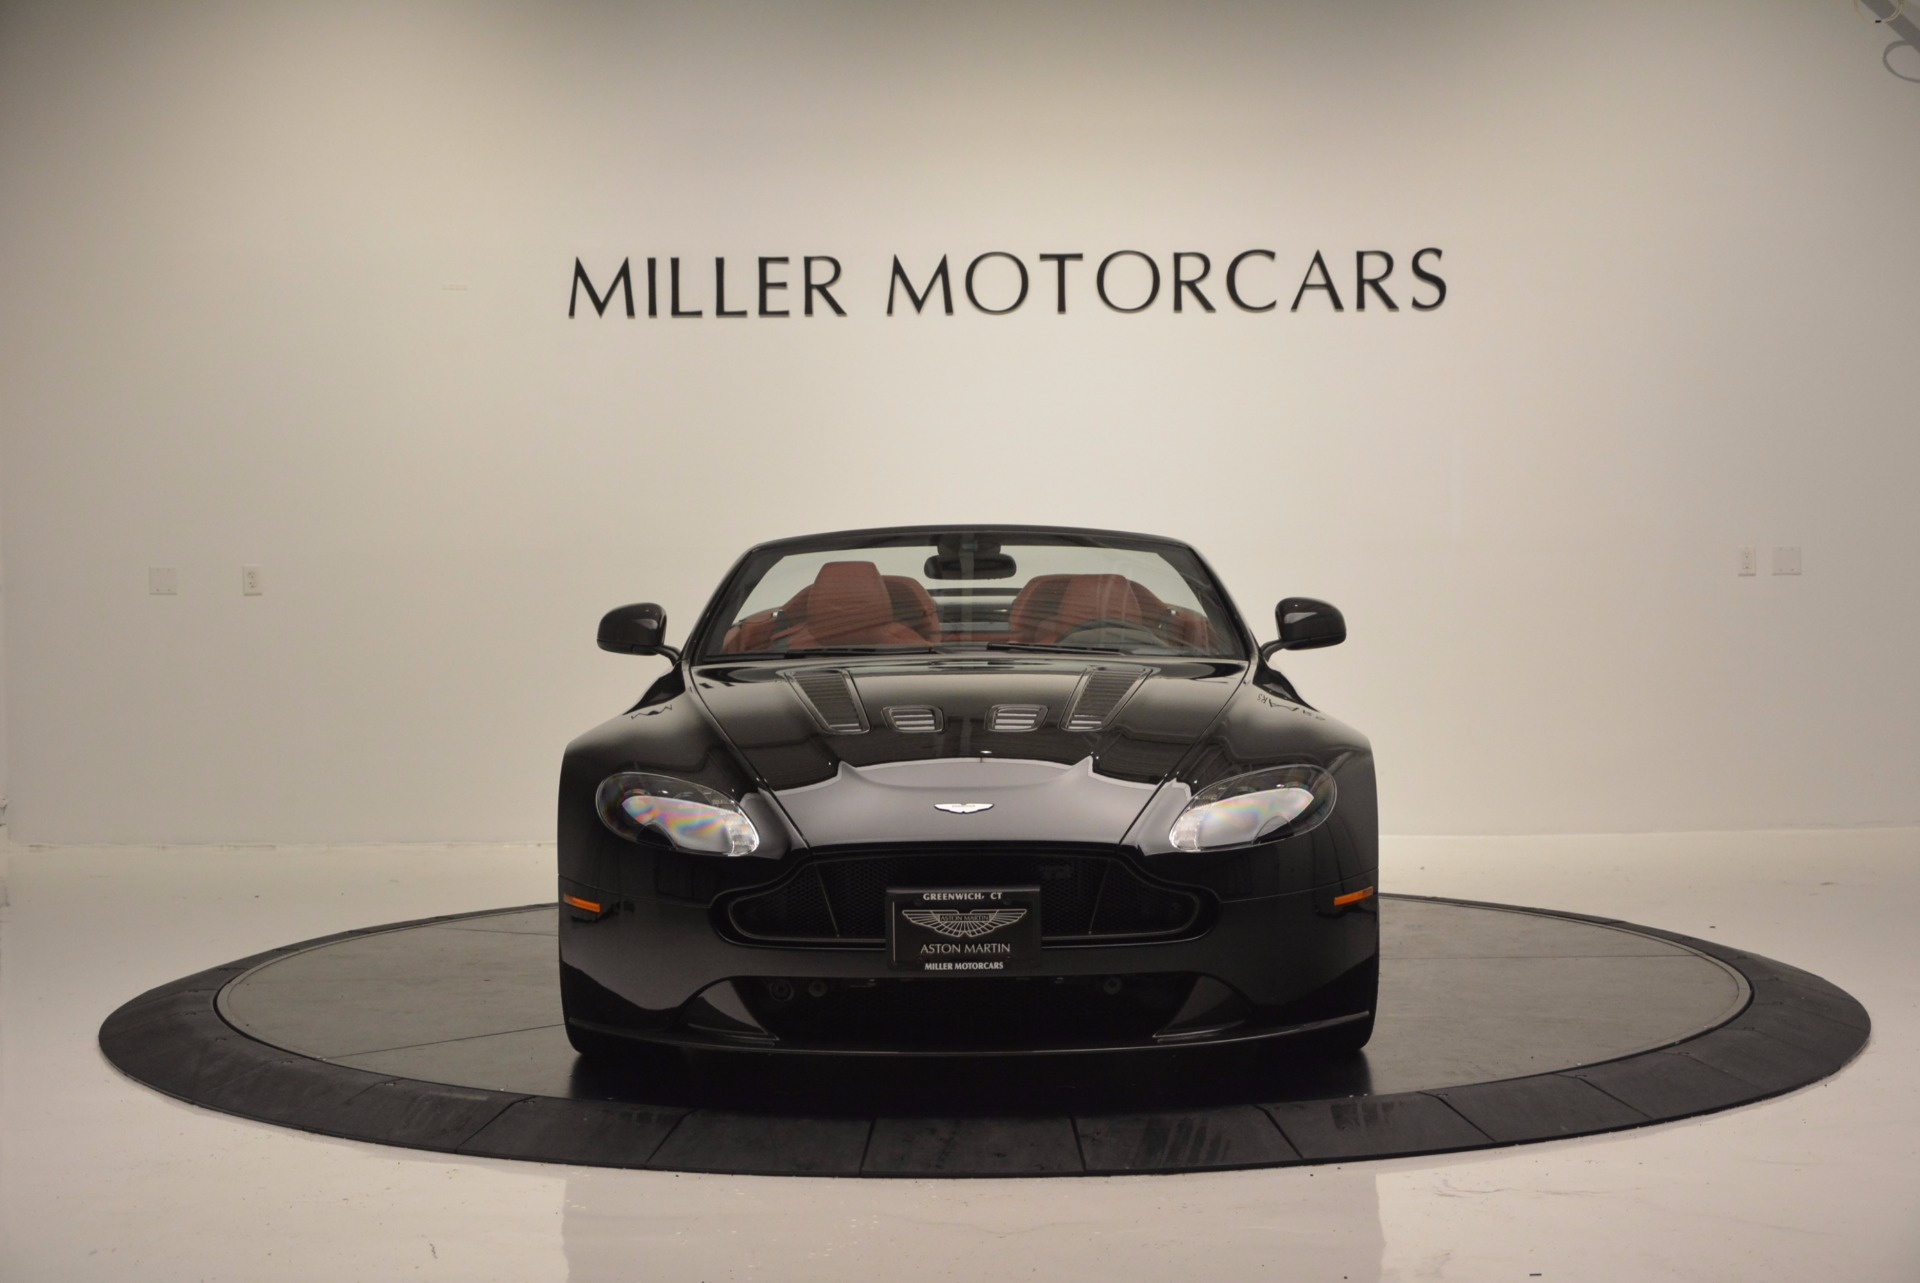 Used 2015 Aston Martin V12 Vantage S Roadster For Sale In Greenwich, CT. Alfa Romeo of Greenwich, 7227 1335_p12